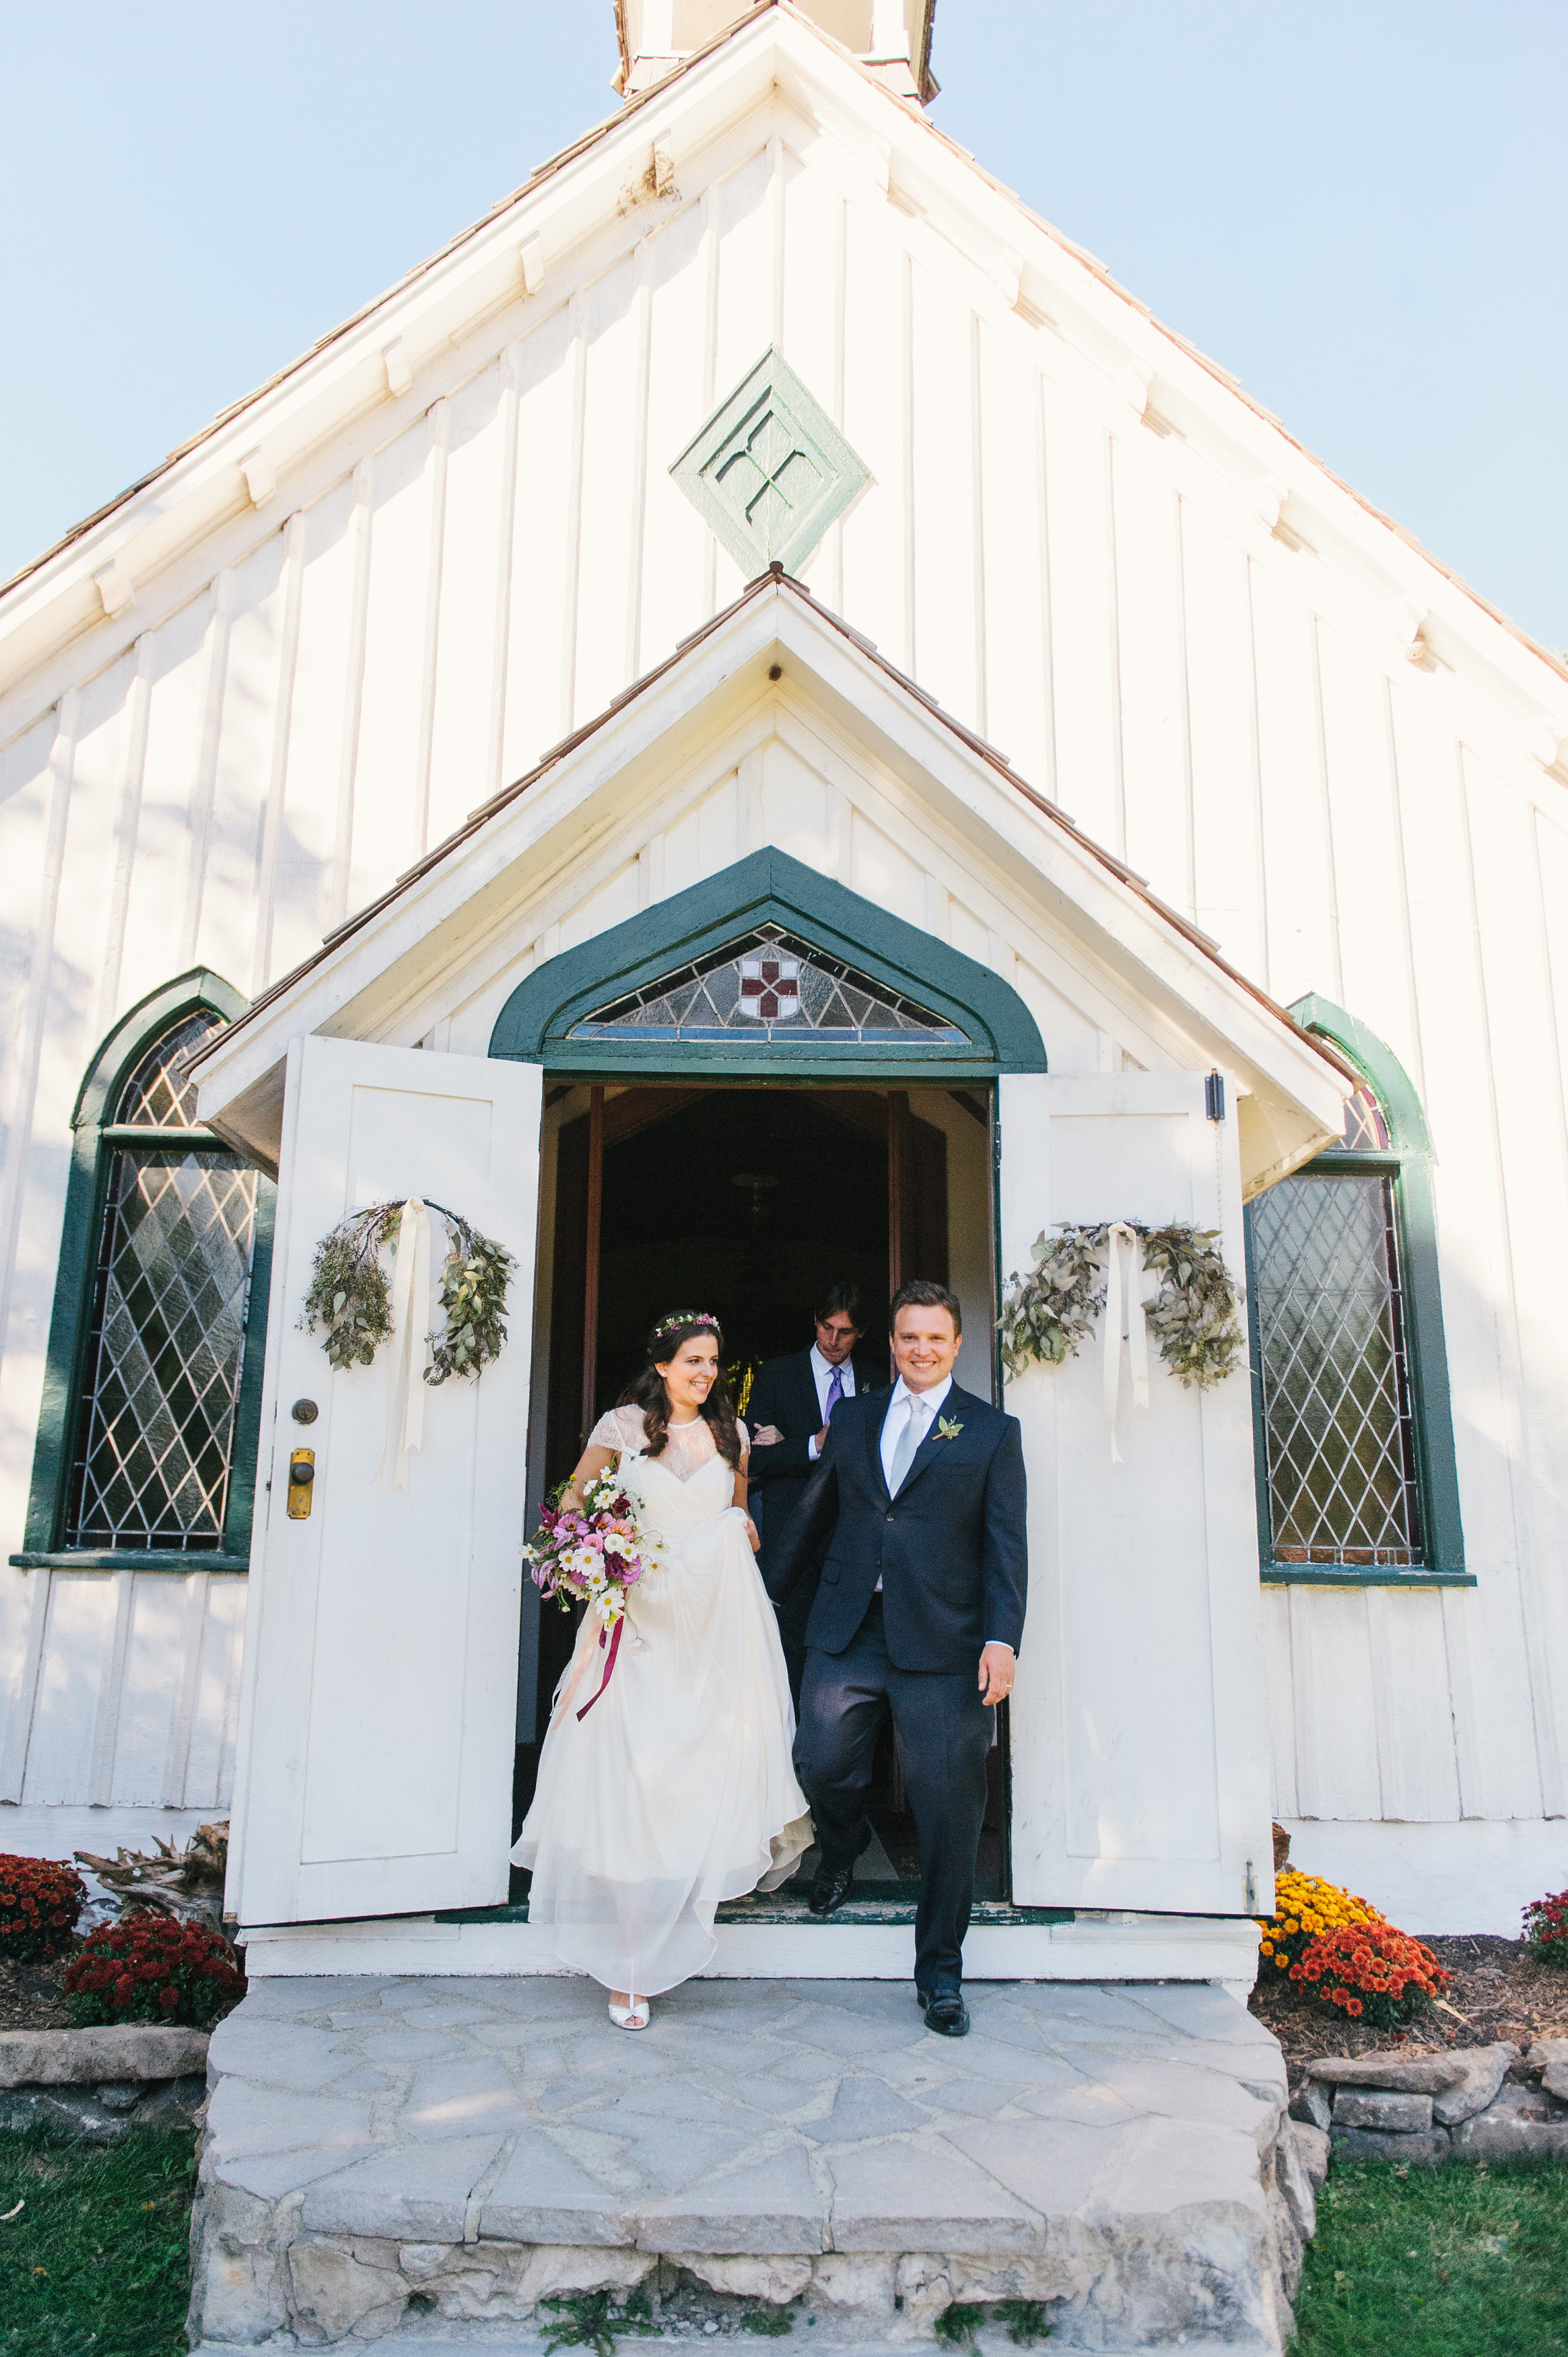 marial-daniel-wedding-balls-falls-sara-wilde-photography-0131.jpg